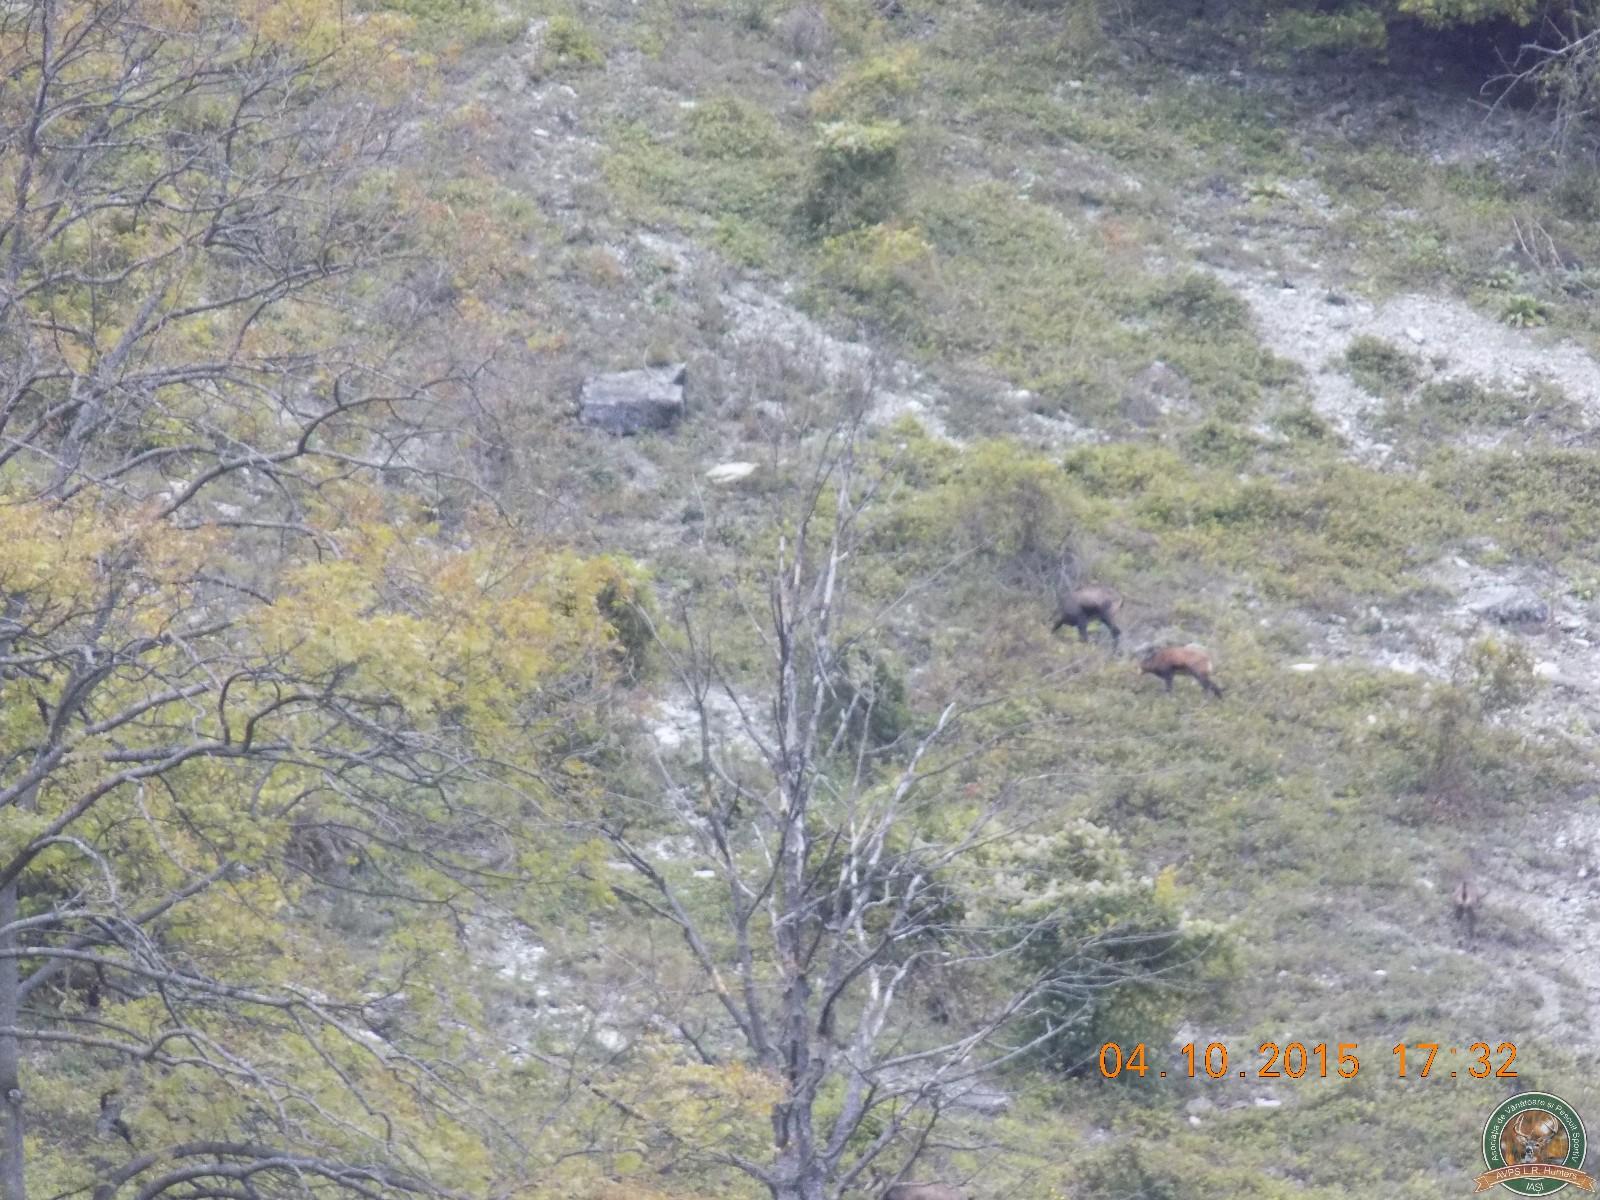 avps-lr-hunters-lepsa_20-59